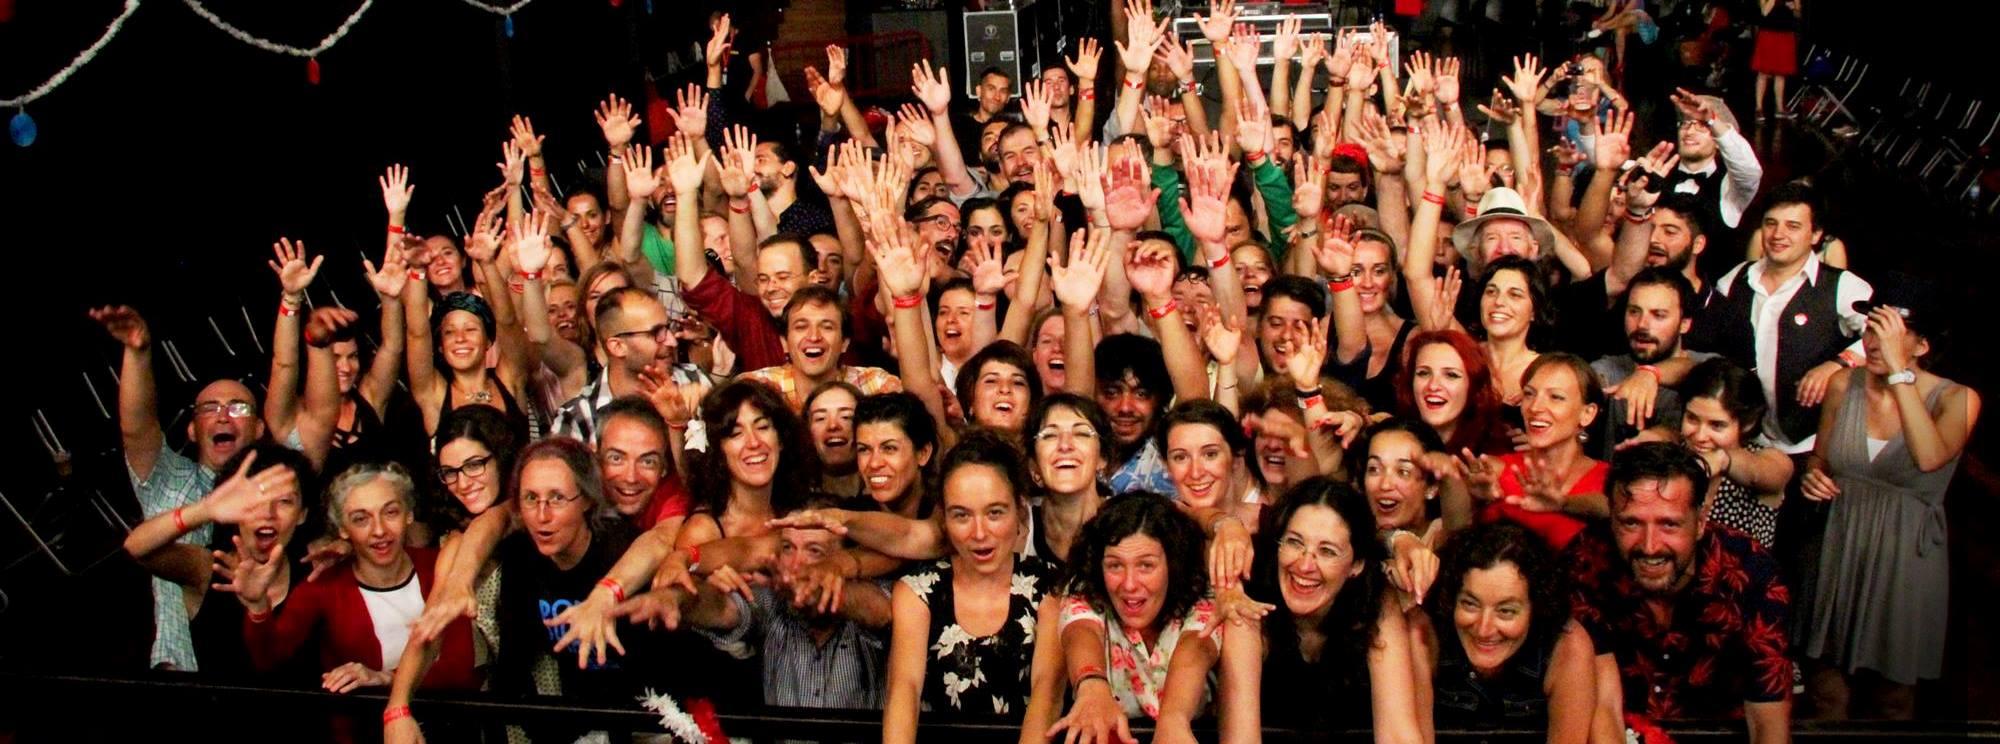 Porto Swing Jam | Lindy Hop Exchange - Swing Dance Portugal